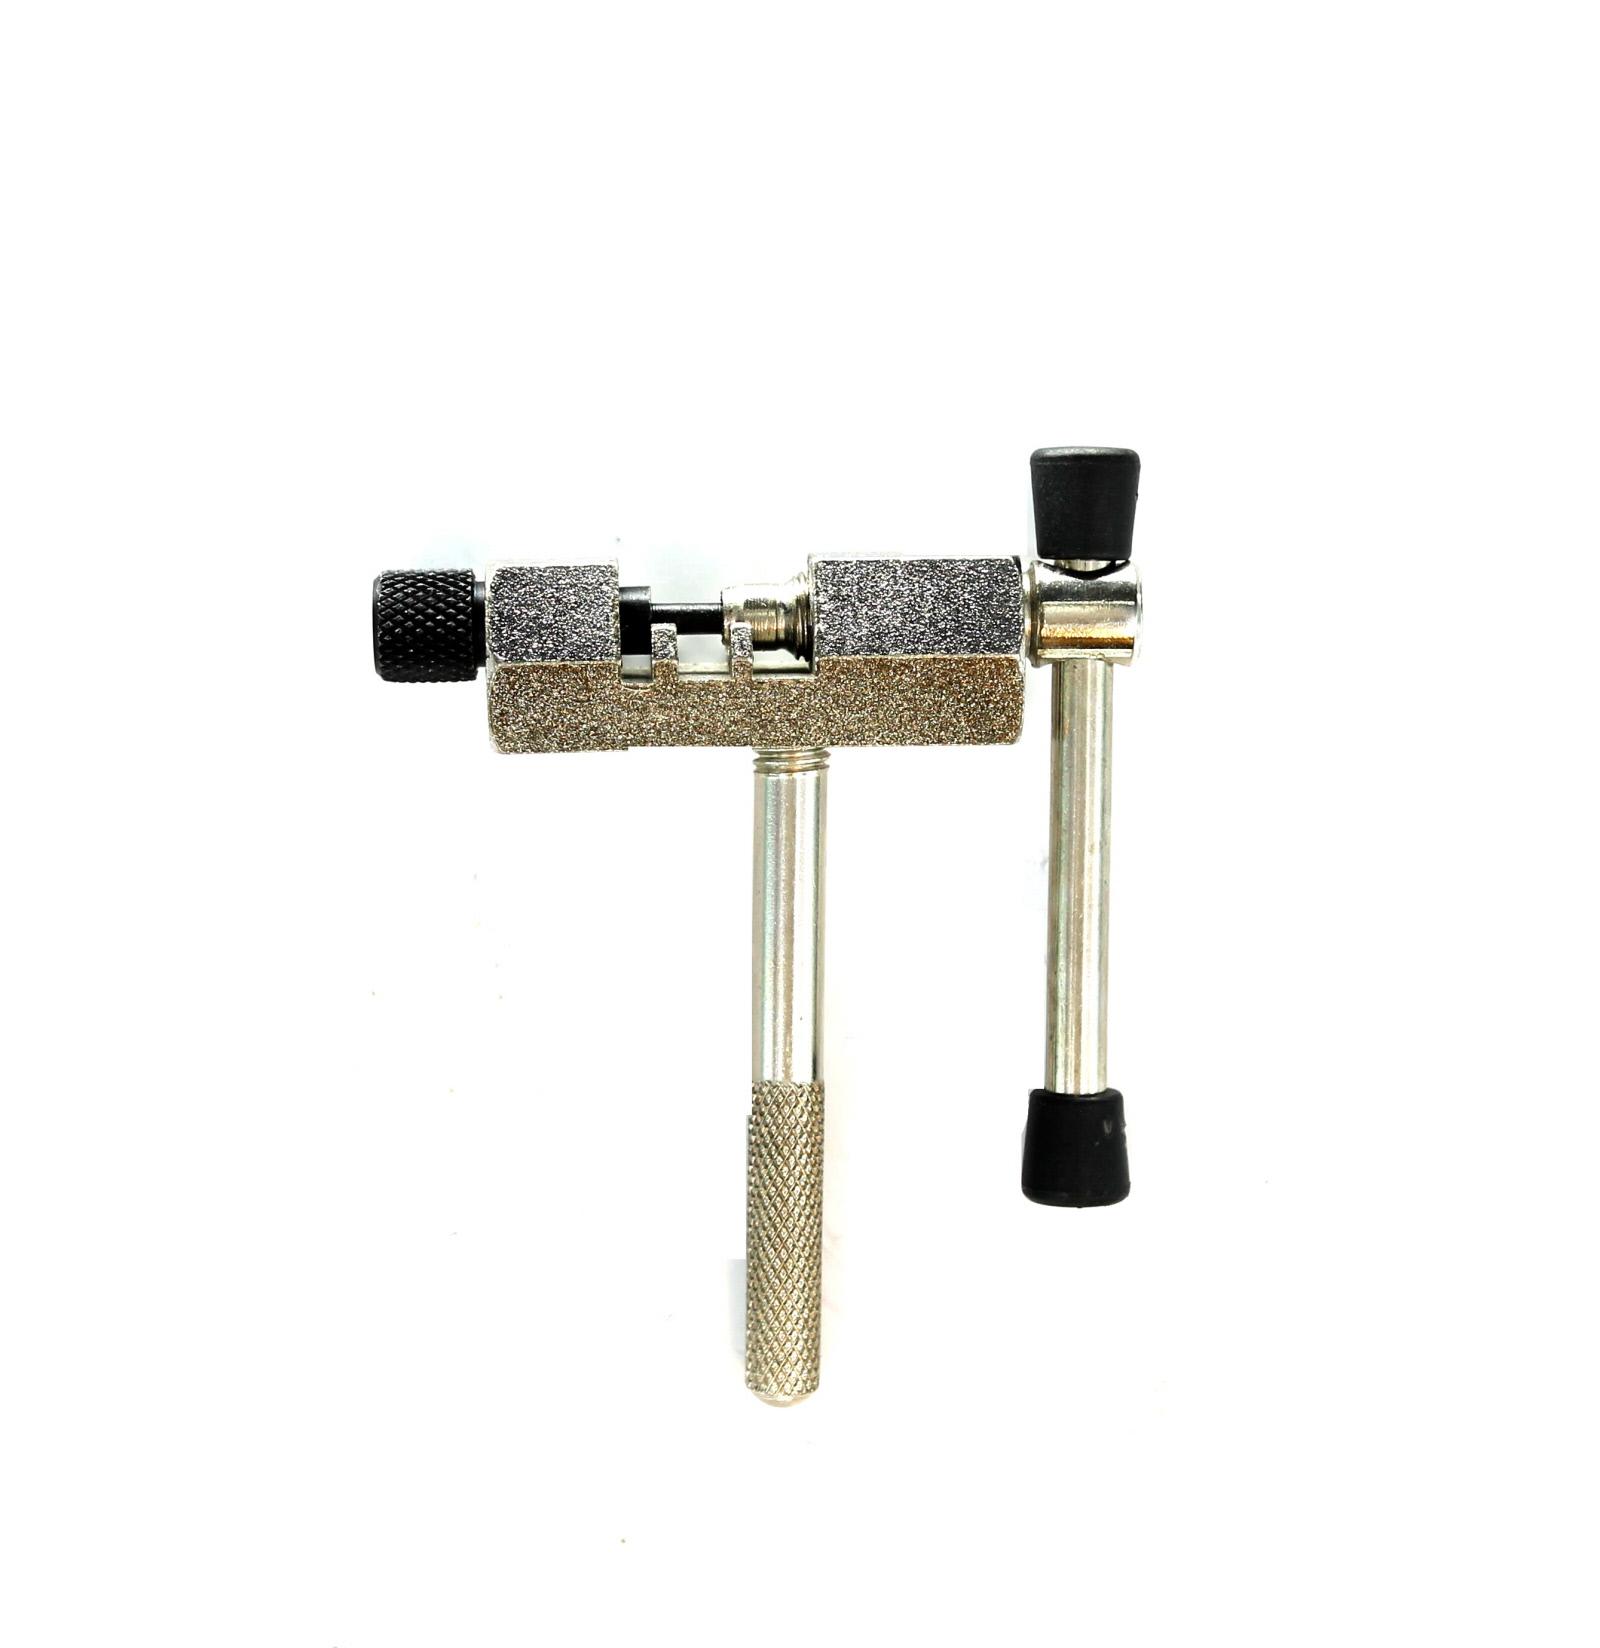 HD Bicycle Bike Cycle Chain Break Rivet Extractor Remover Breaker Garage Tool